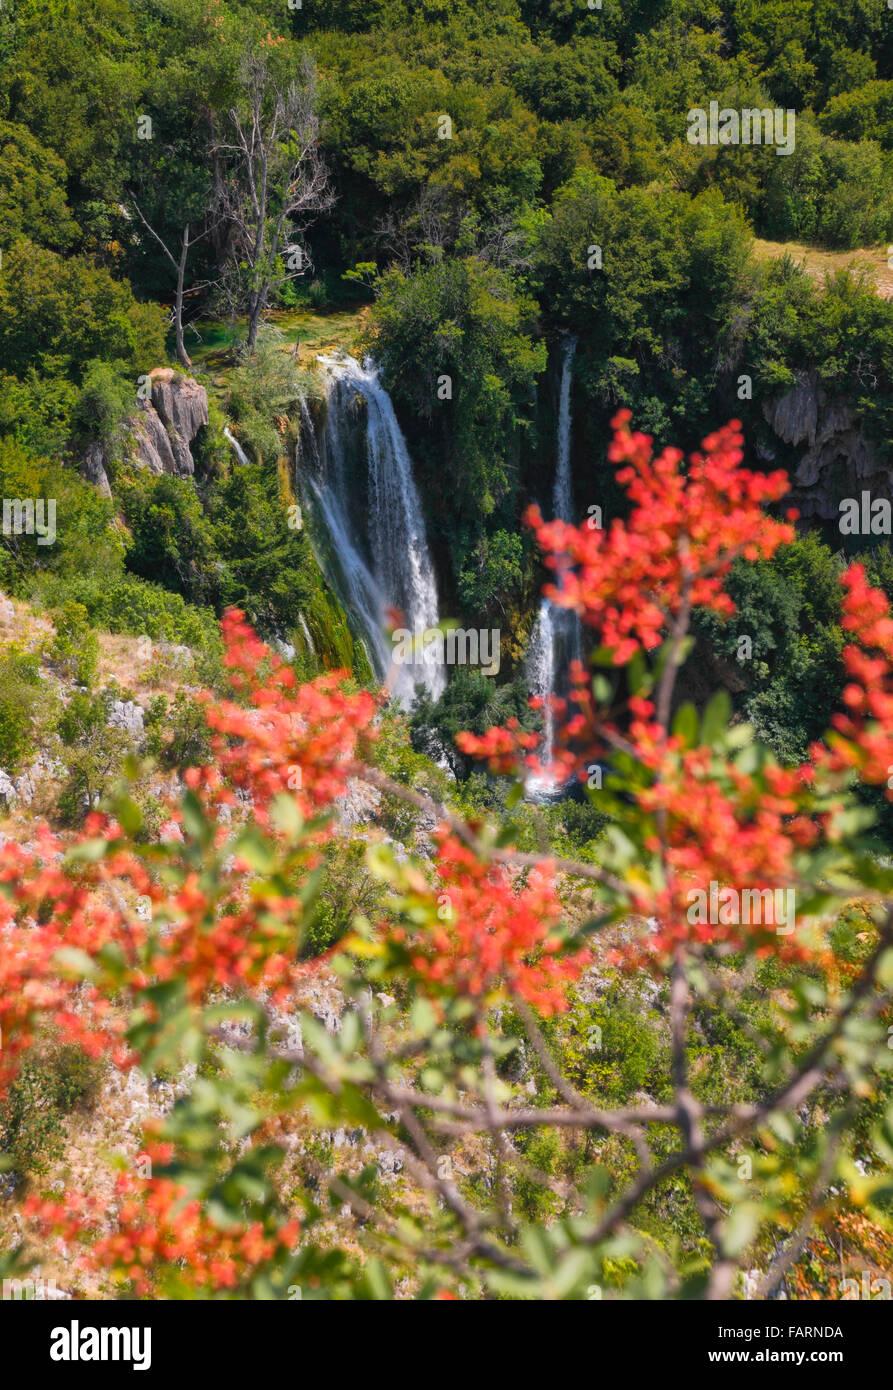 Krka national Park, waterfall Manojlovac. - Stock Image